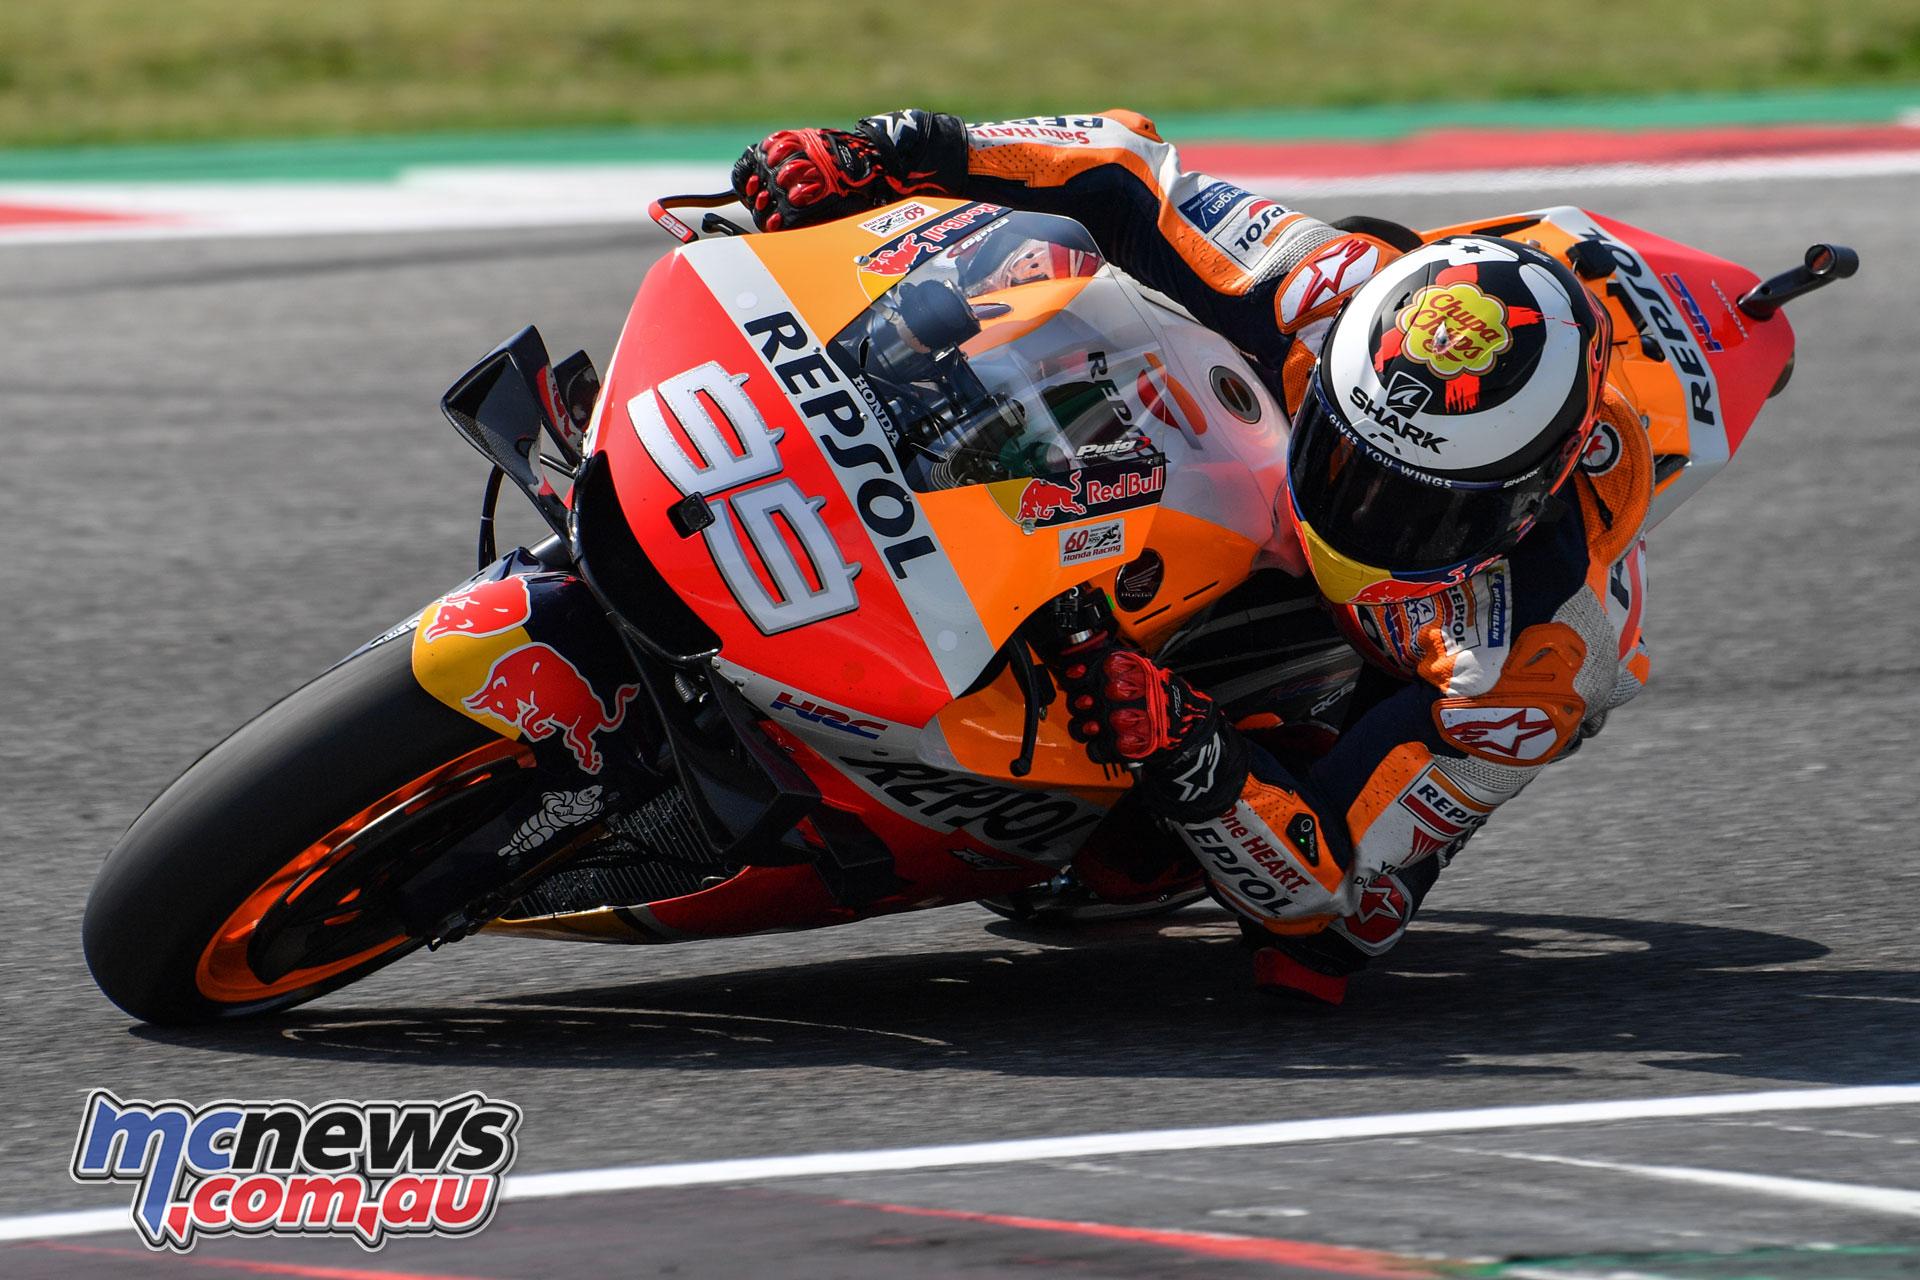 MotoGP Test Misano D Lorenzo